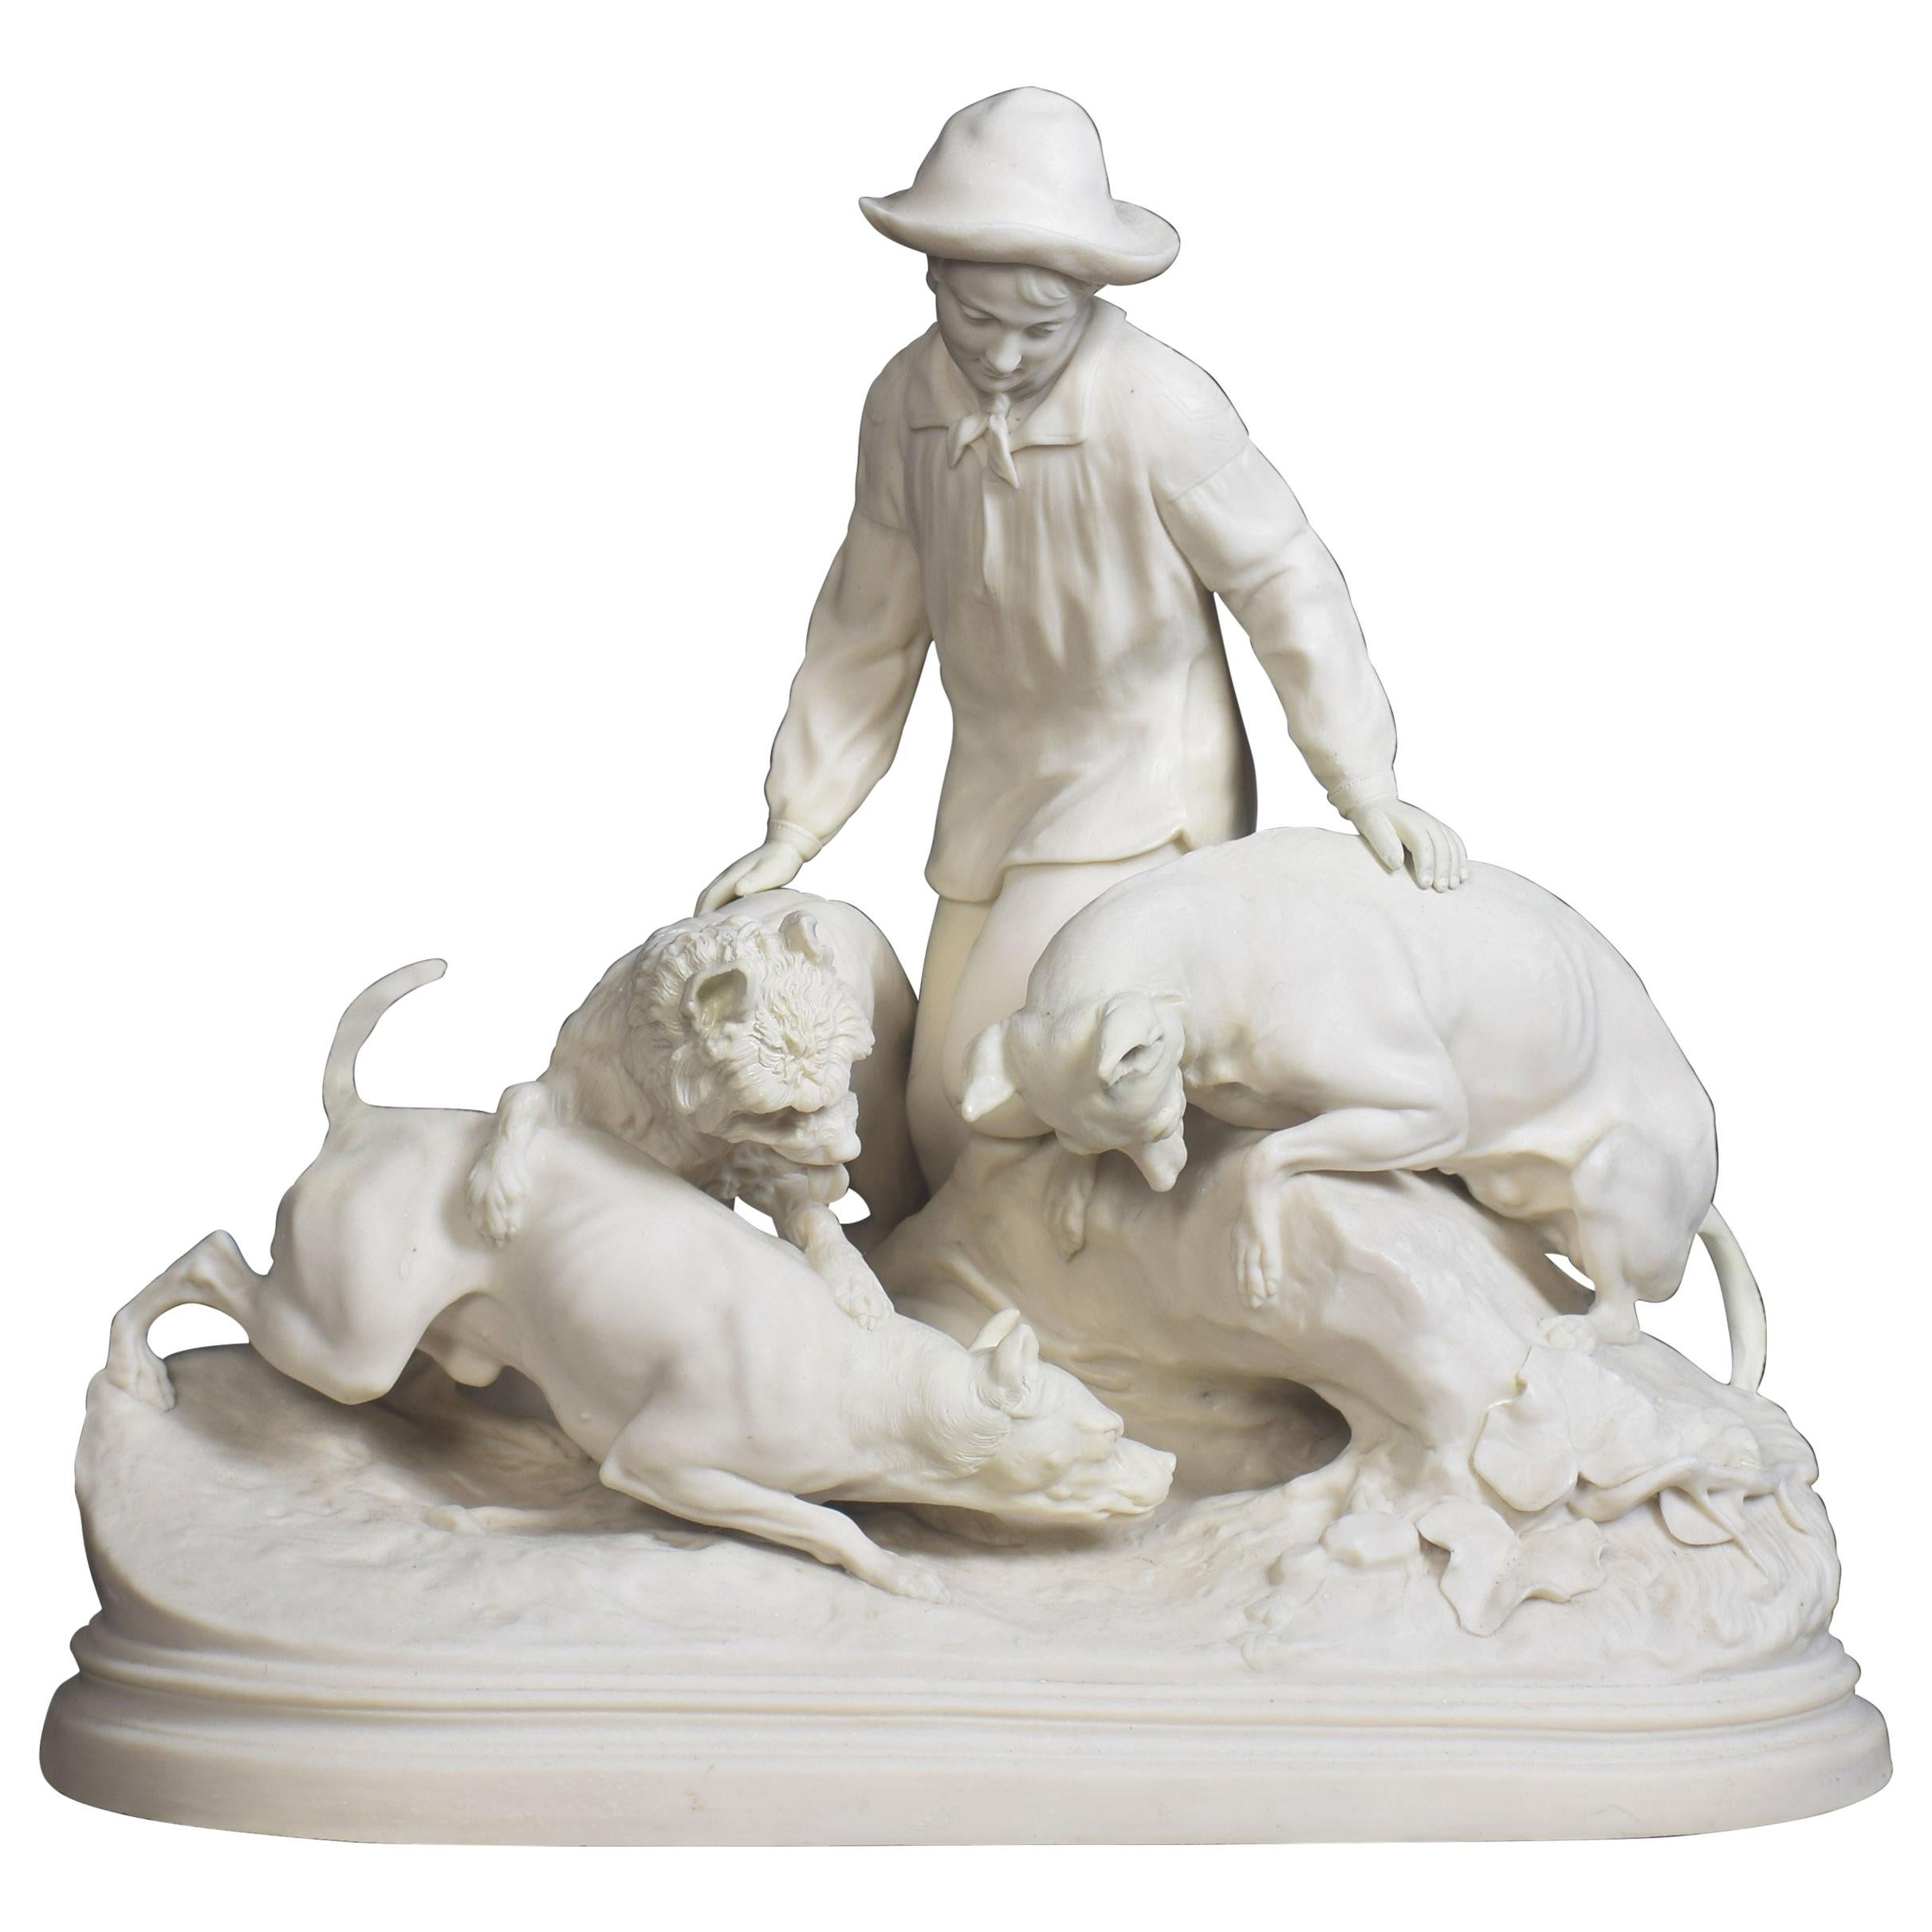 Parian Ware Figure Group